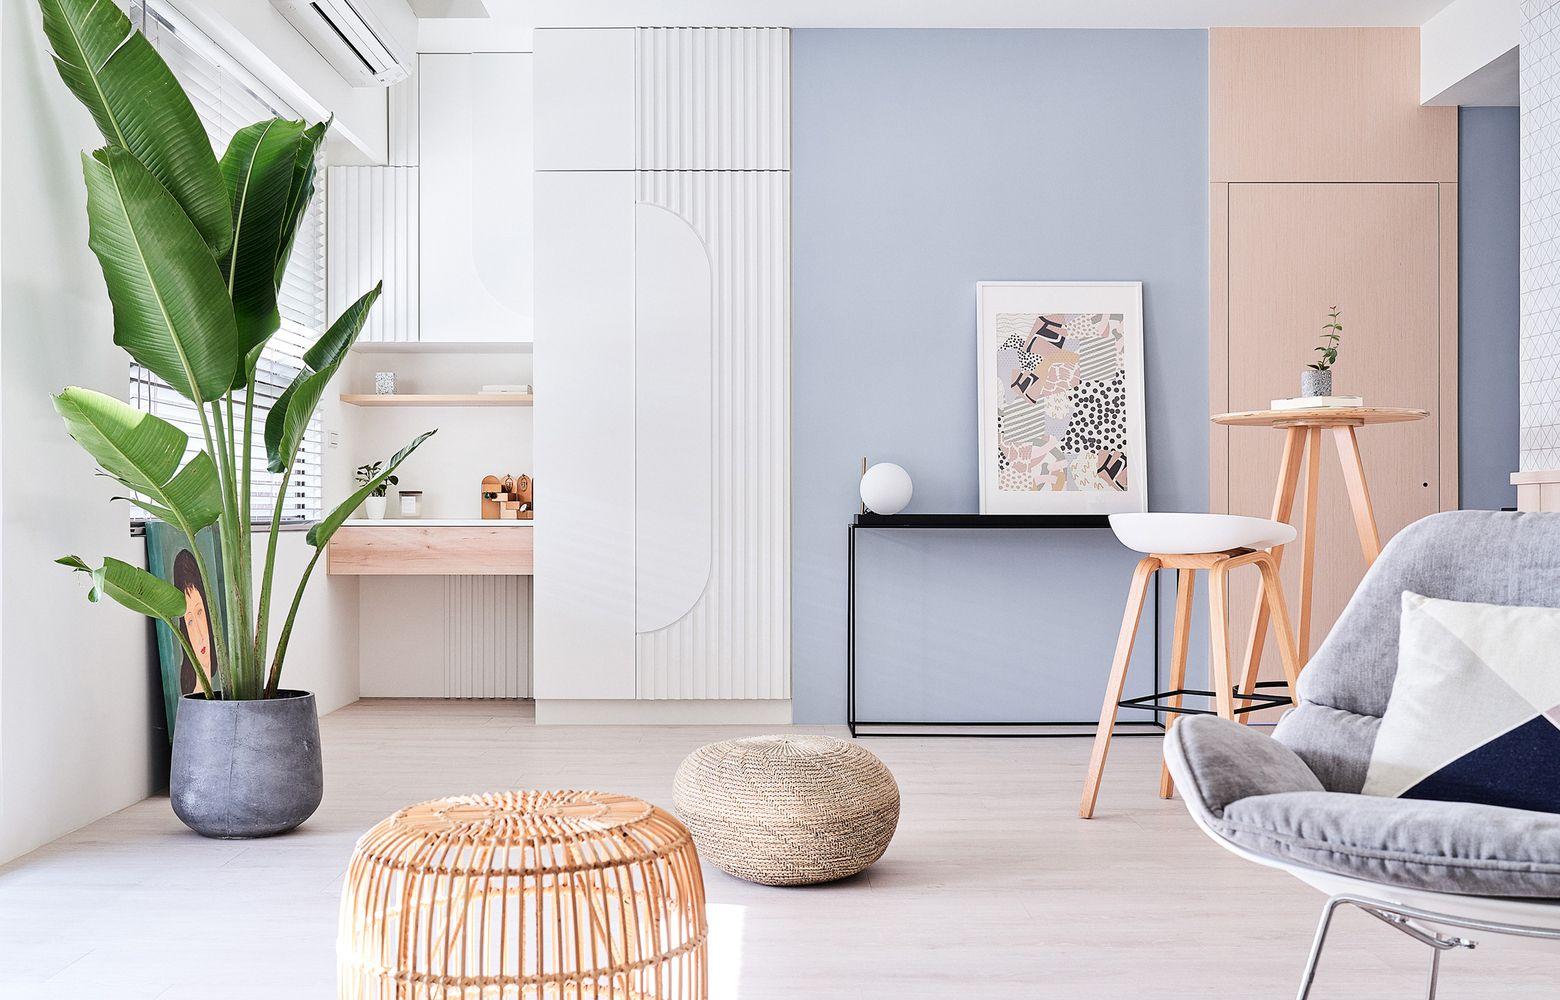 Basic needs of interior designing